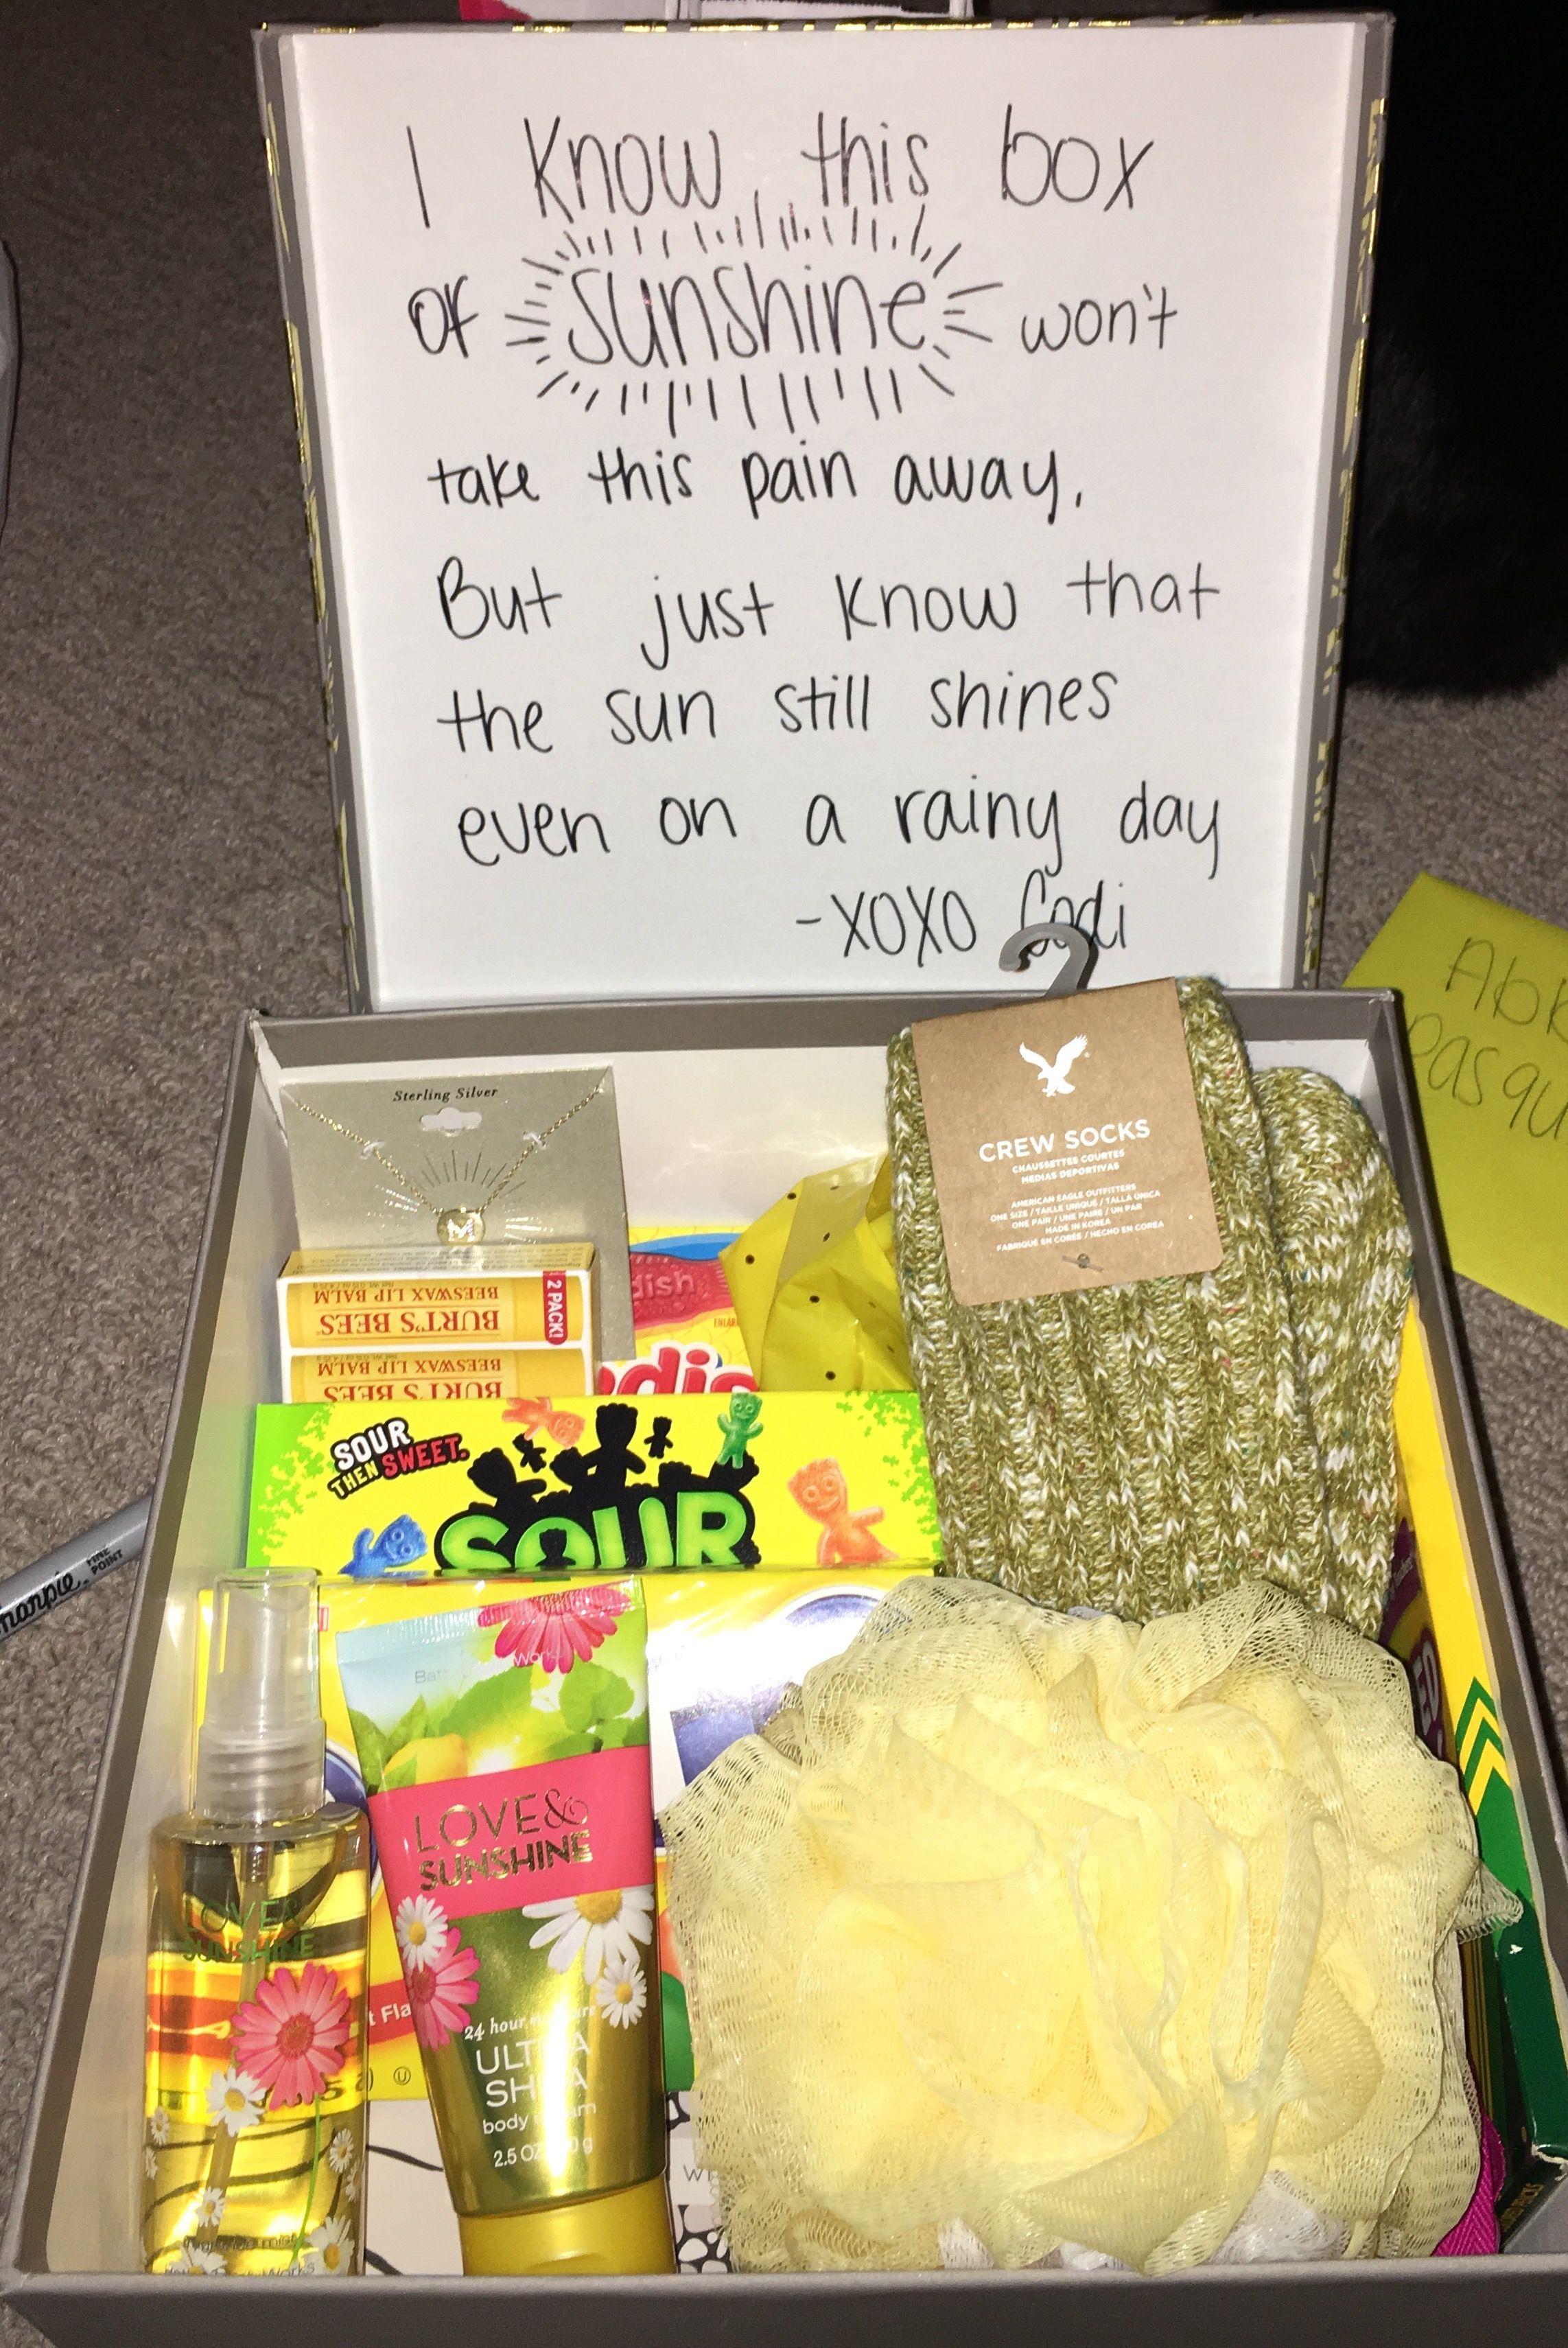 care package for grieving friend Good idea! Pinterest